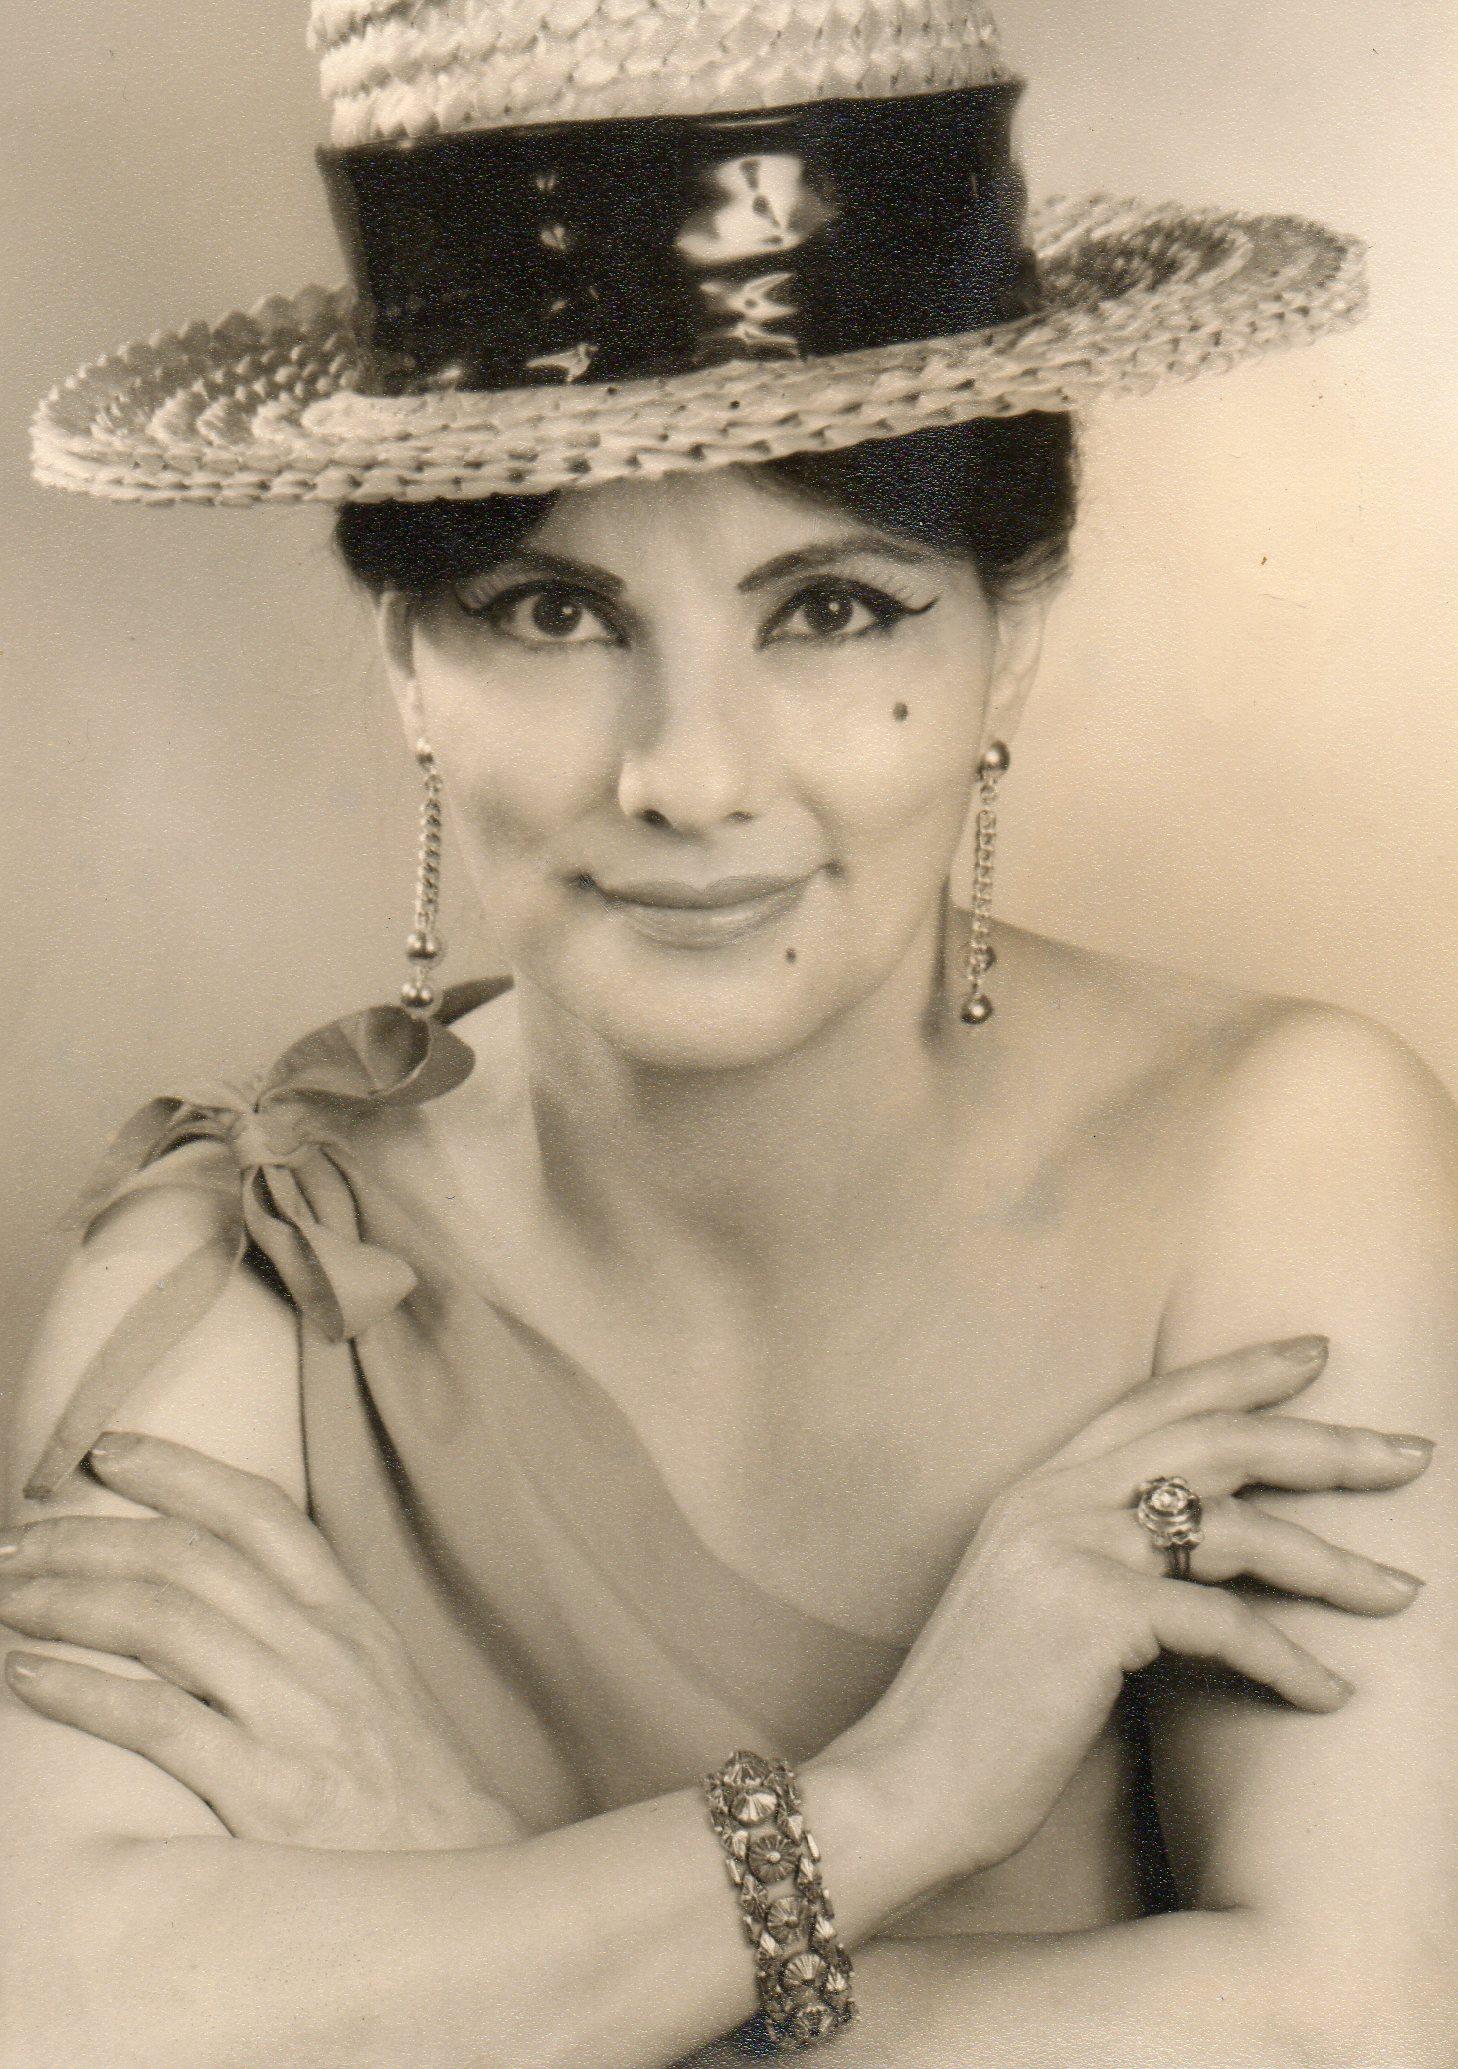 Imi Portrait in Straw Hat (1).jpg